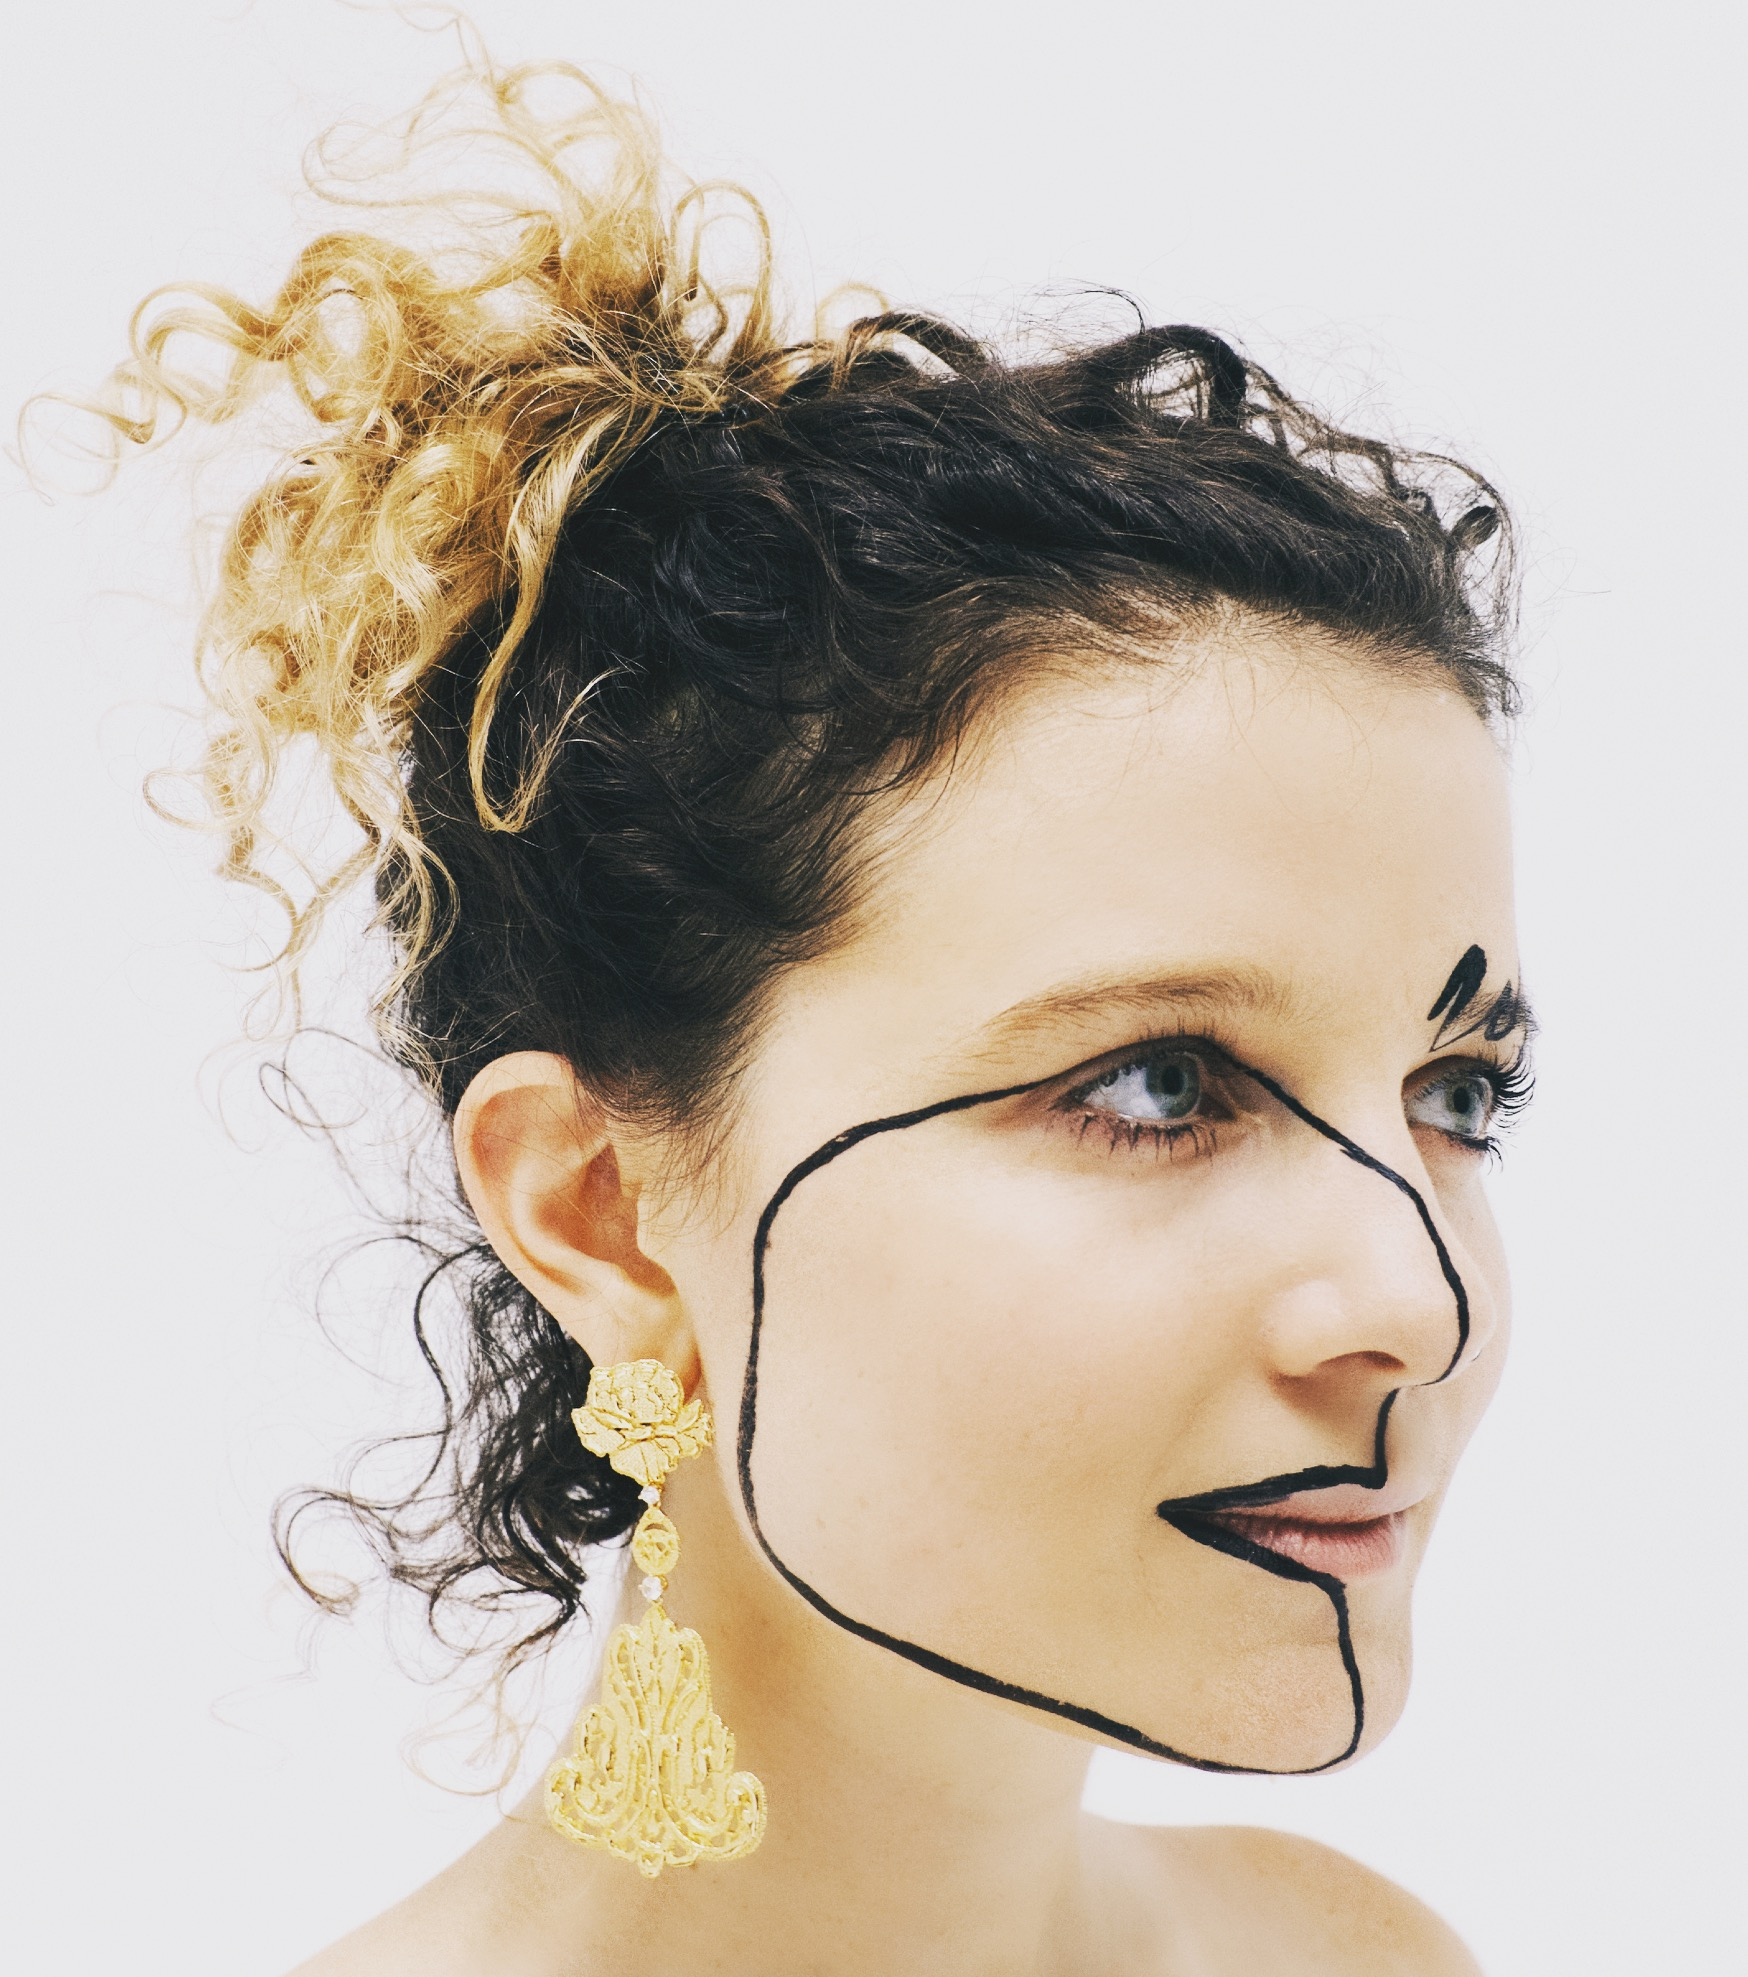 Makeup Headshot.JPG